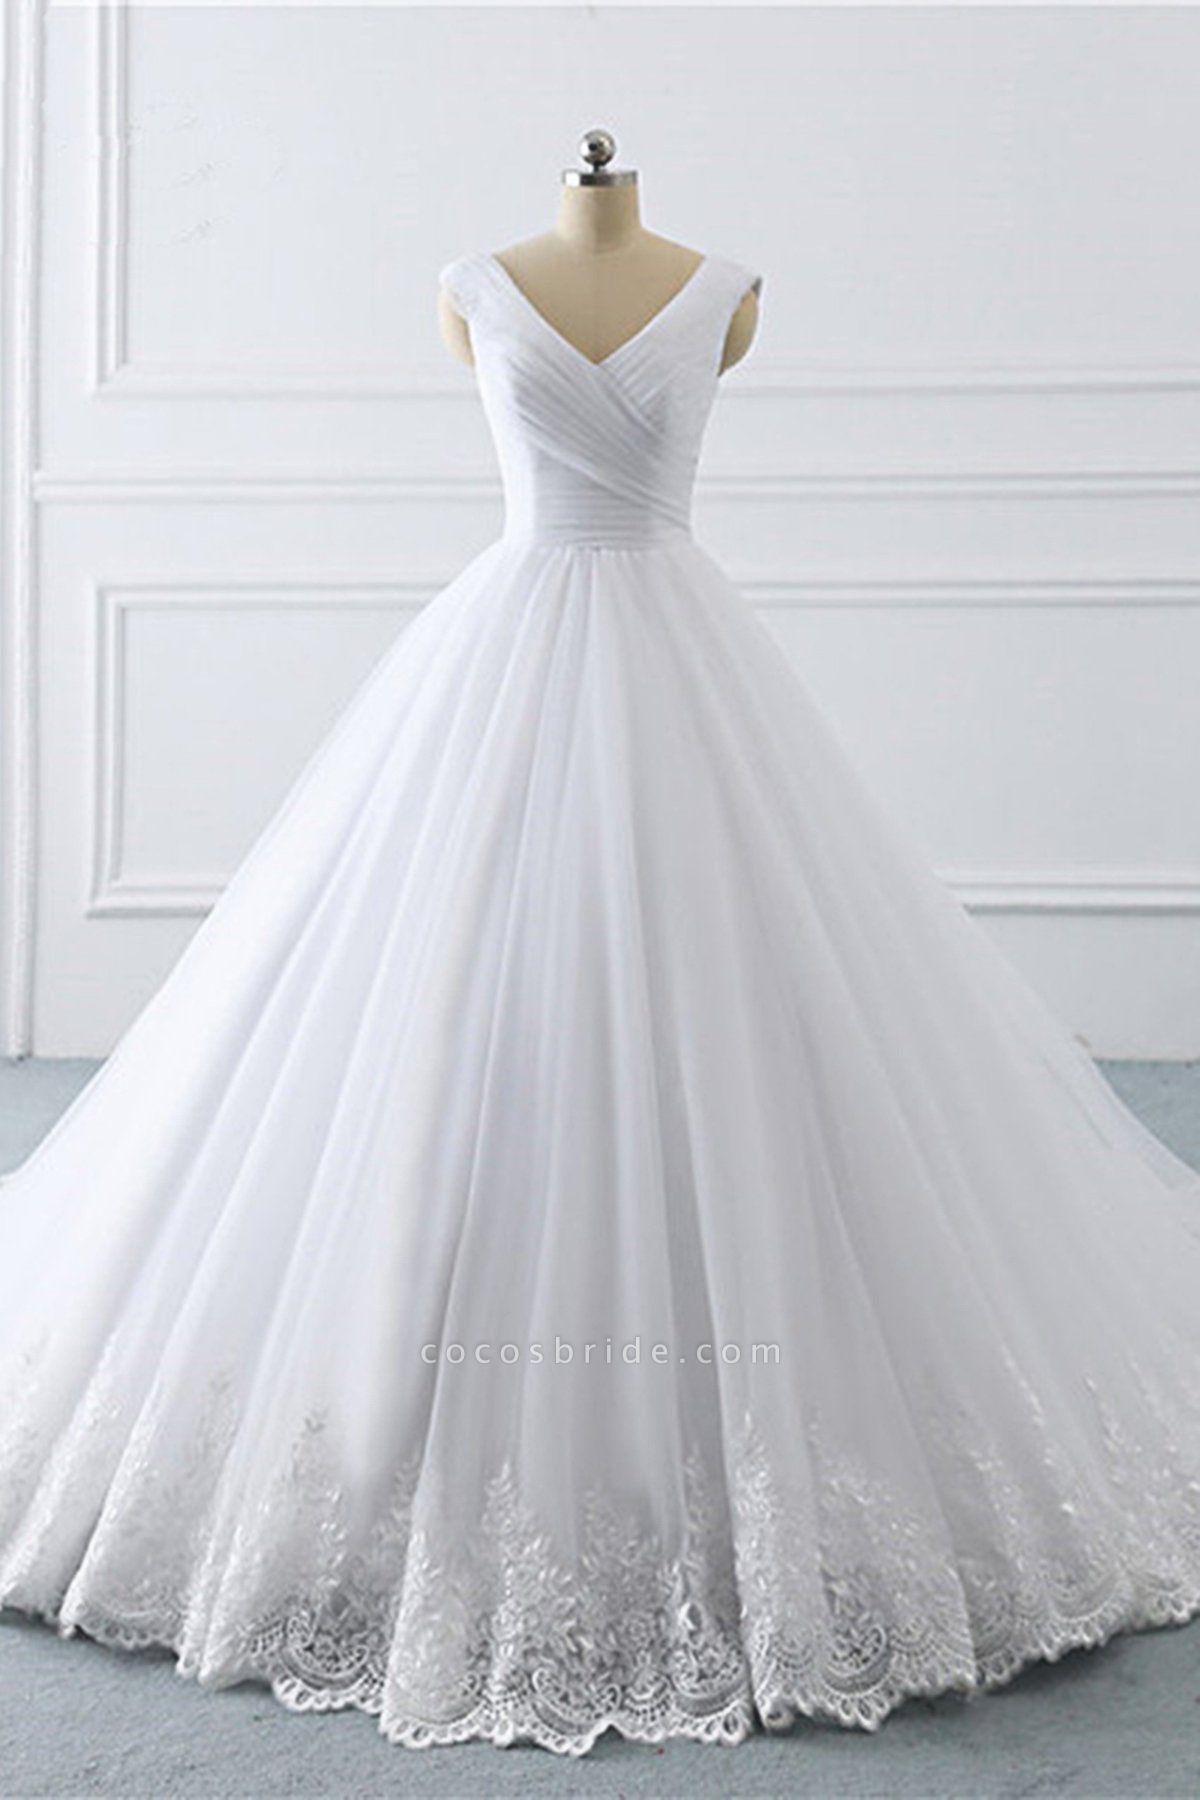 Unique White Lace V Neck Puffy Sweep Train Wedding Dress